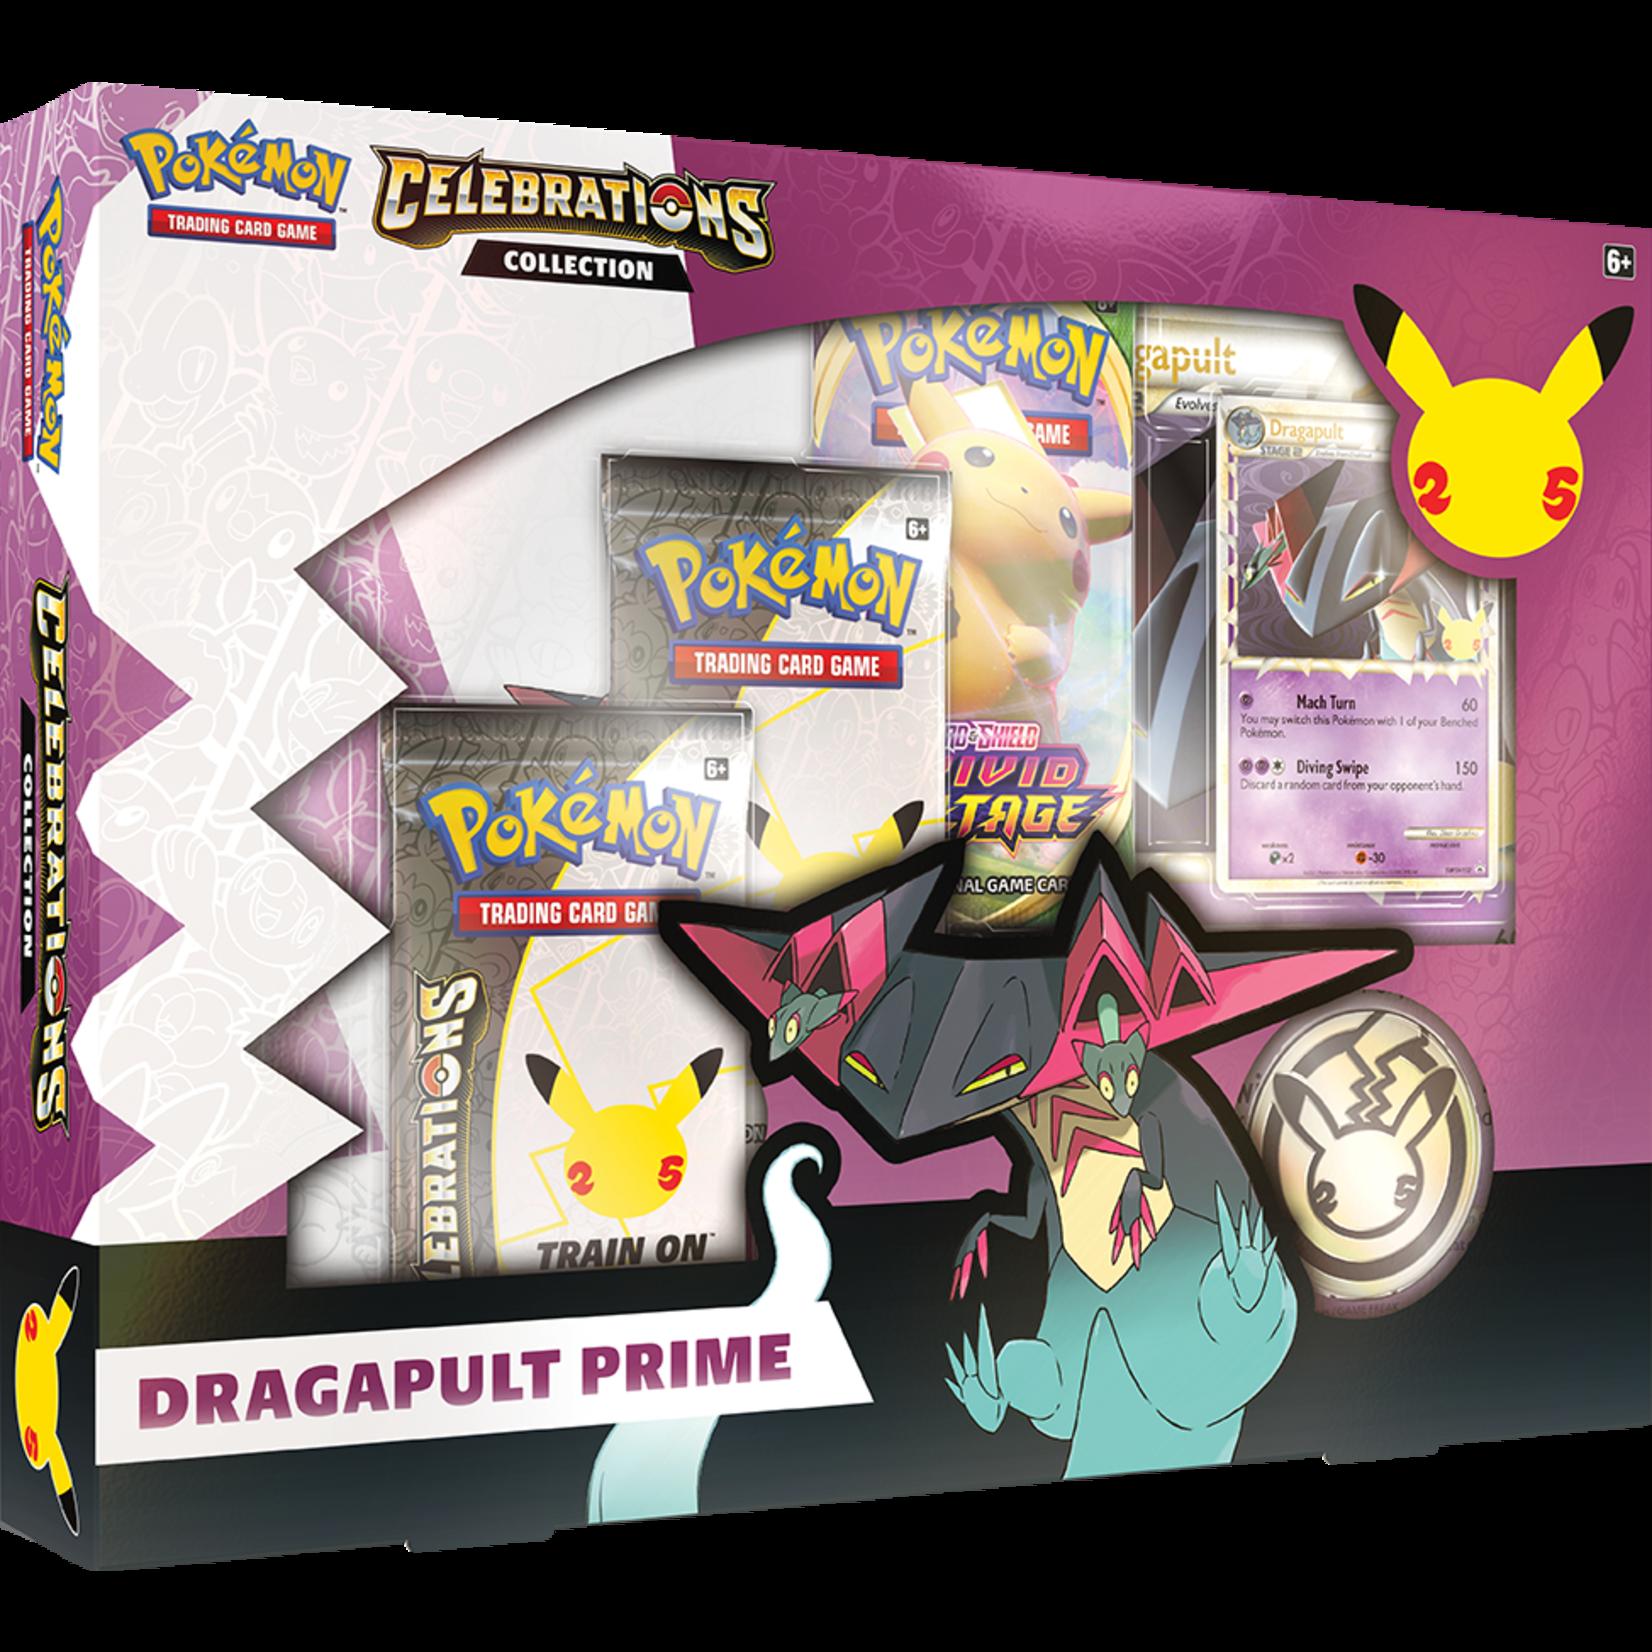 Pokémon Pokémon TCG: Celebrations Collection—Dragapult Prime